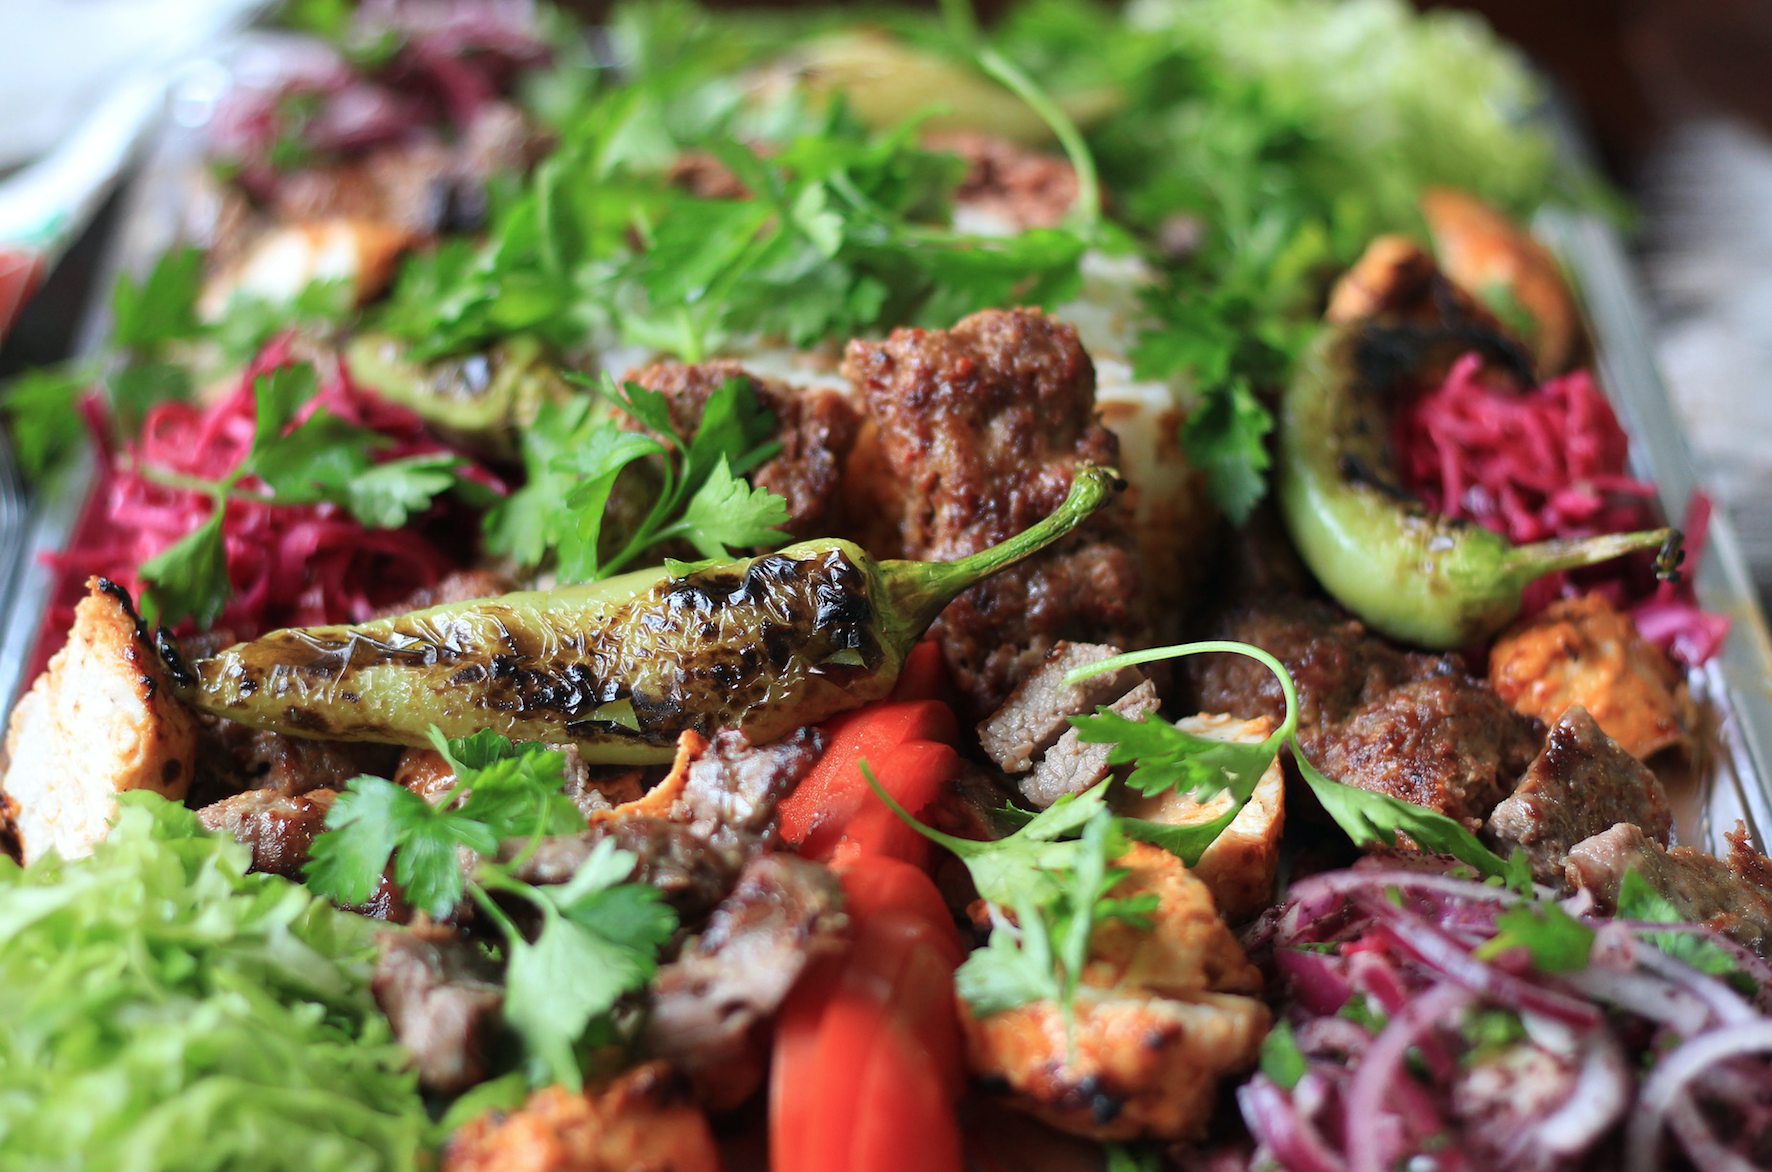 tyrkisk madlavningskursus i kappadokien, tyrkisk madlavning i kappadokien, tyrkisk mad, det tyrkiske køkken, oplevelser i Kappadokien, oplevelser i cappadocia, seværdigheder i kappadokien